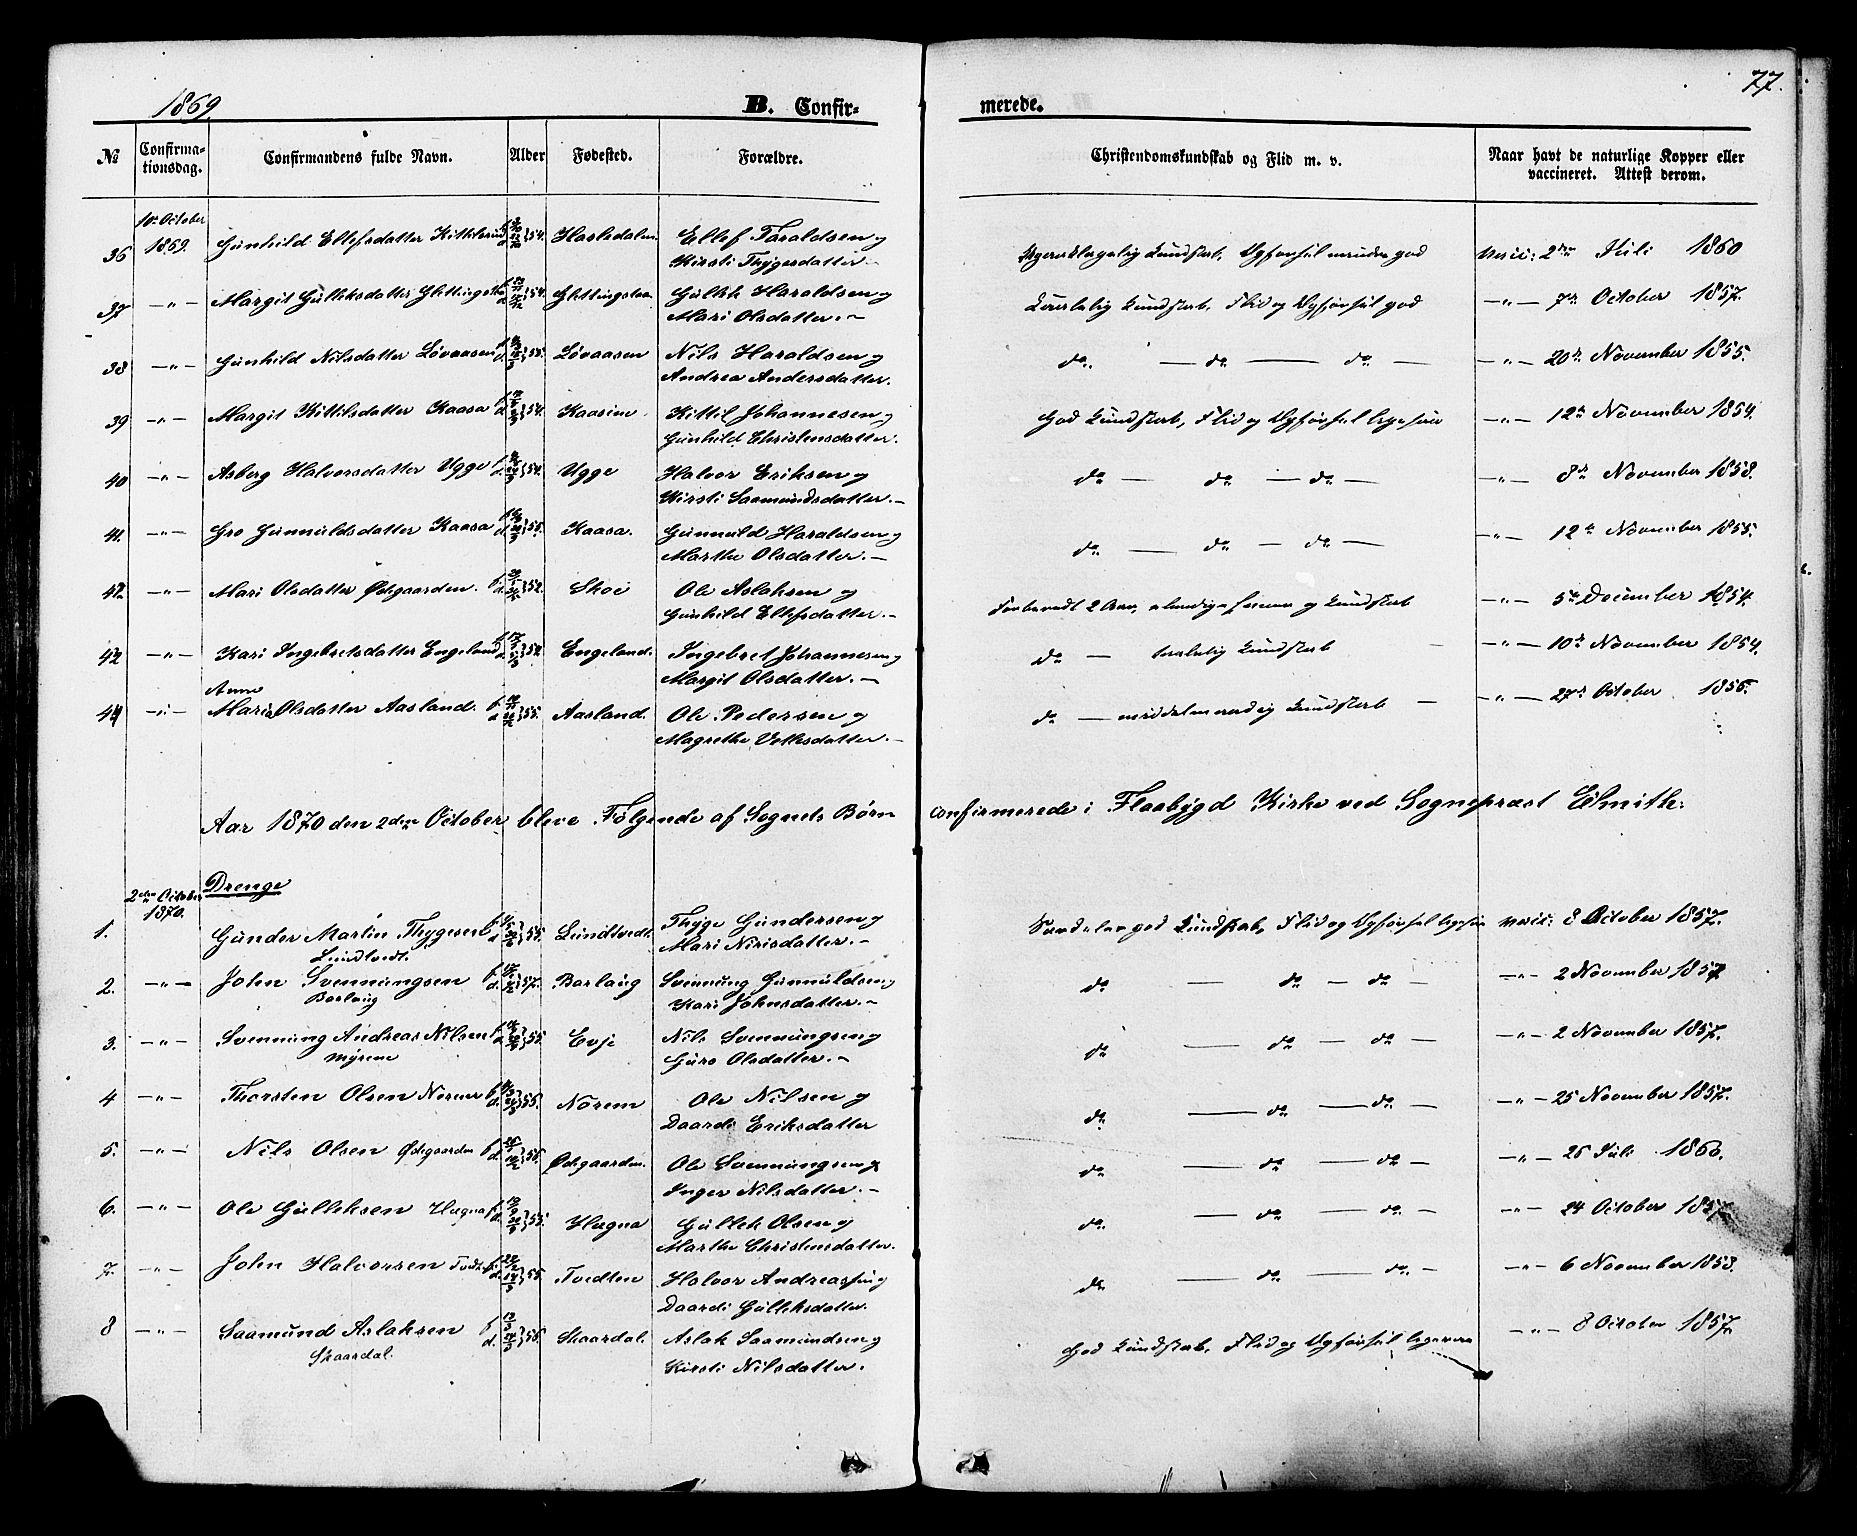 SAKO, Lunde kirkebøker, F/Fa/L0001: Ministerialbok nr. I 1, 1866-1883, s. 77